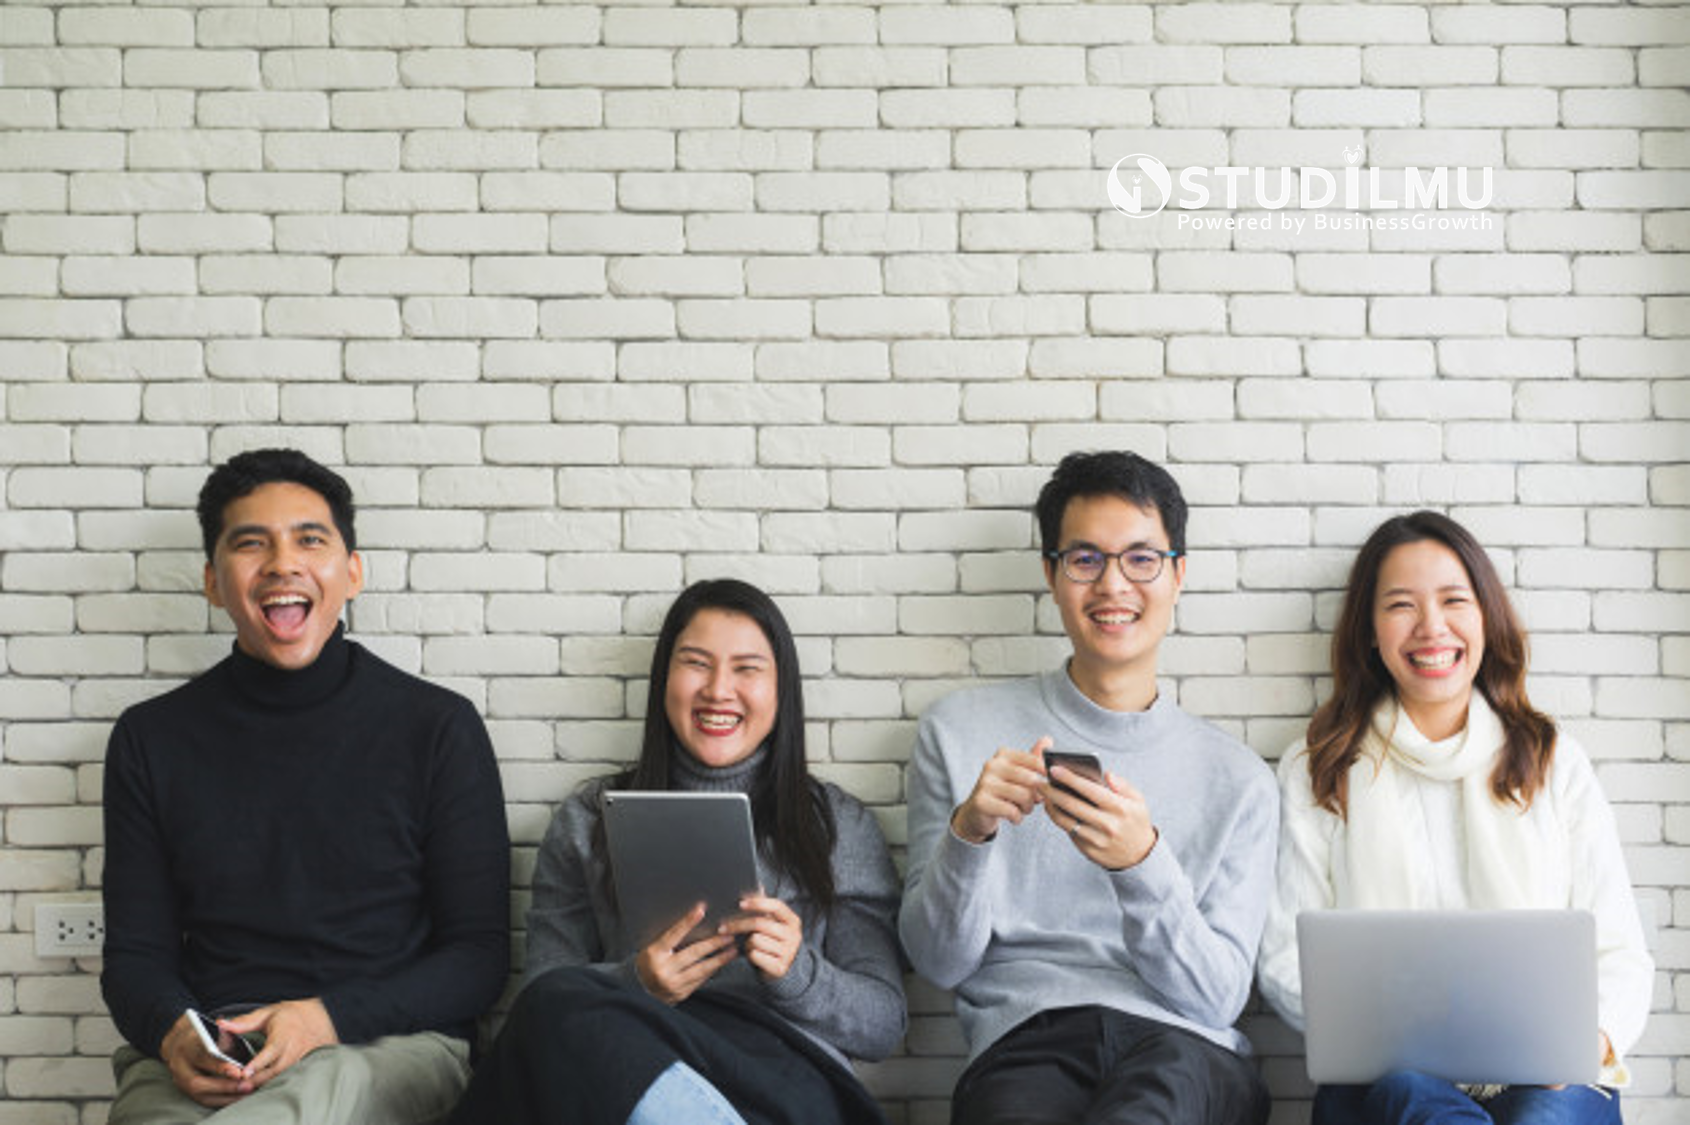 STUDILMU Career Advice - 5 Komunikasi Organisasi yang Mematikan Semangat Kerja Tim